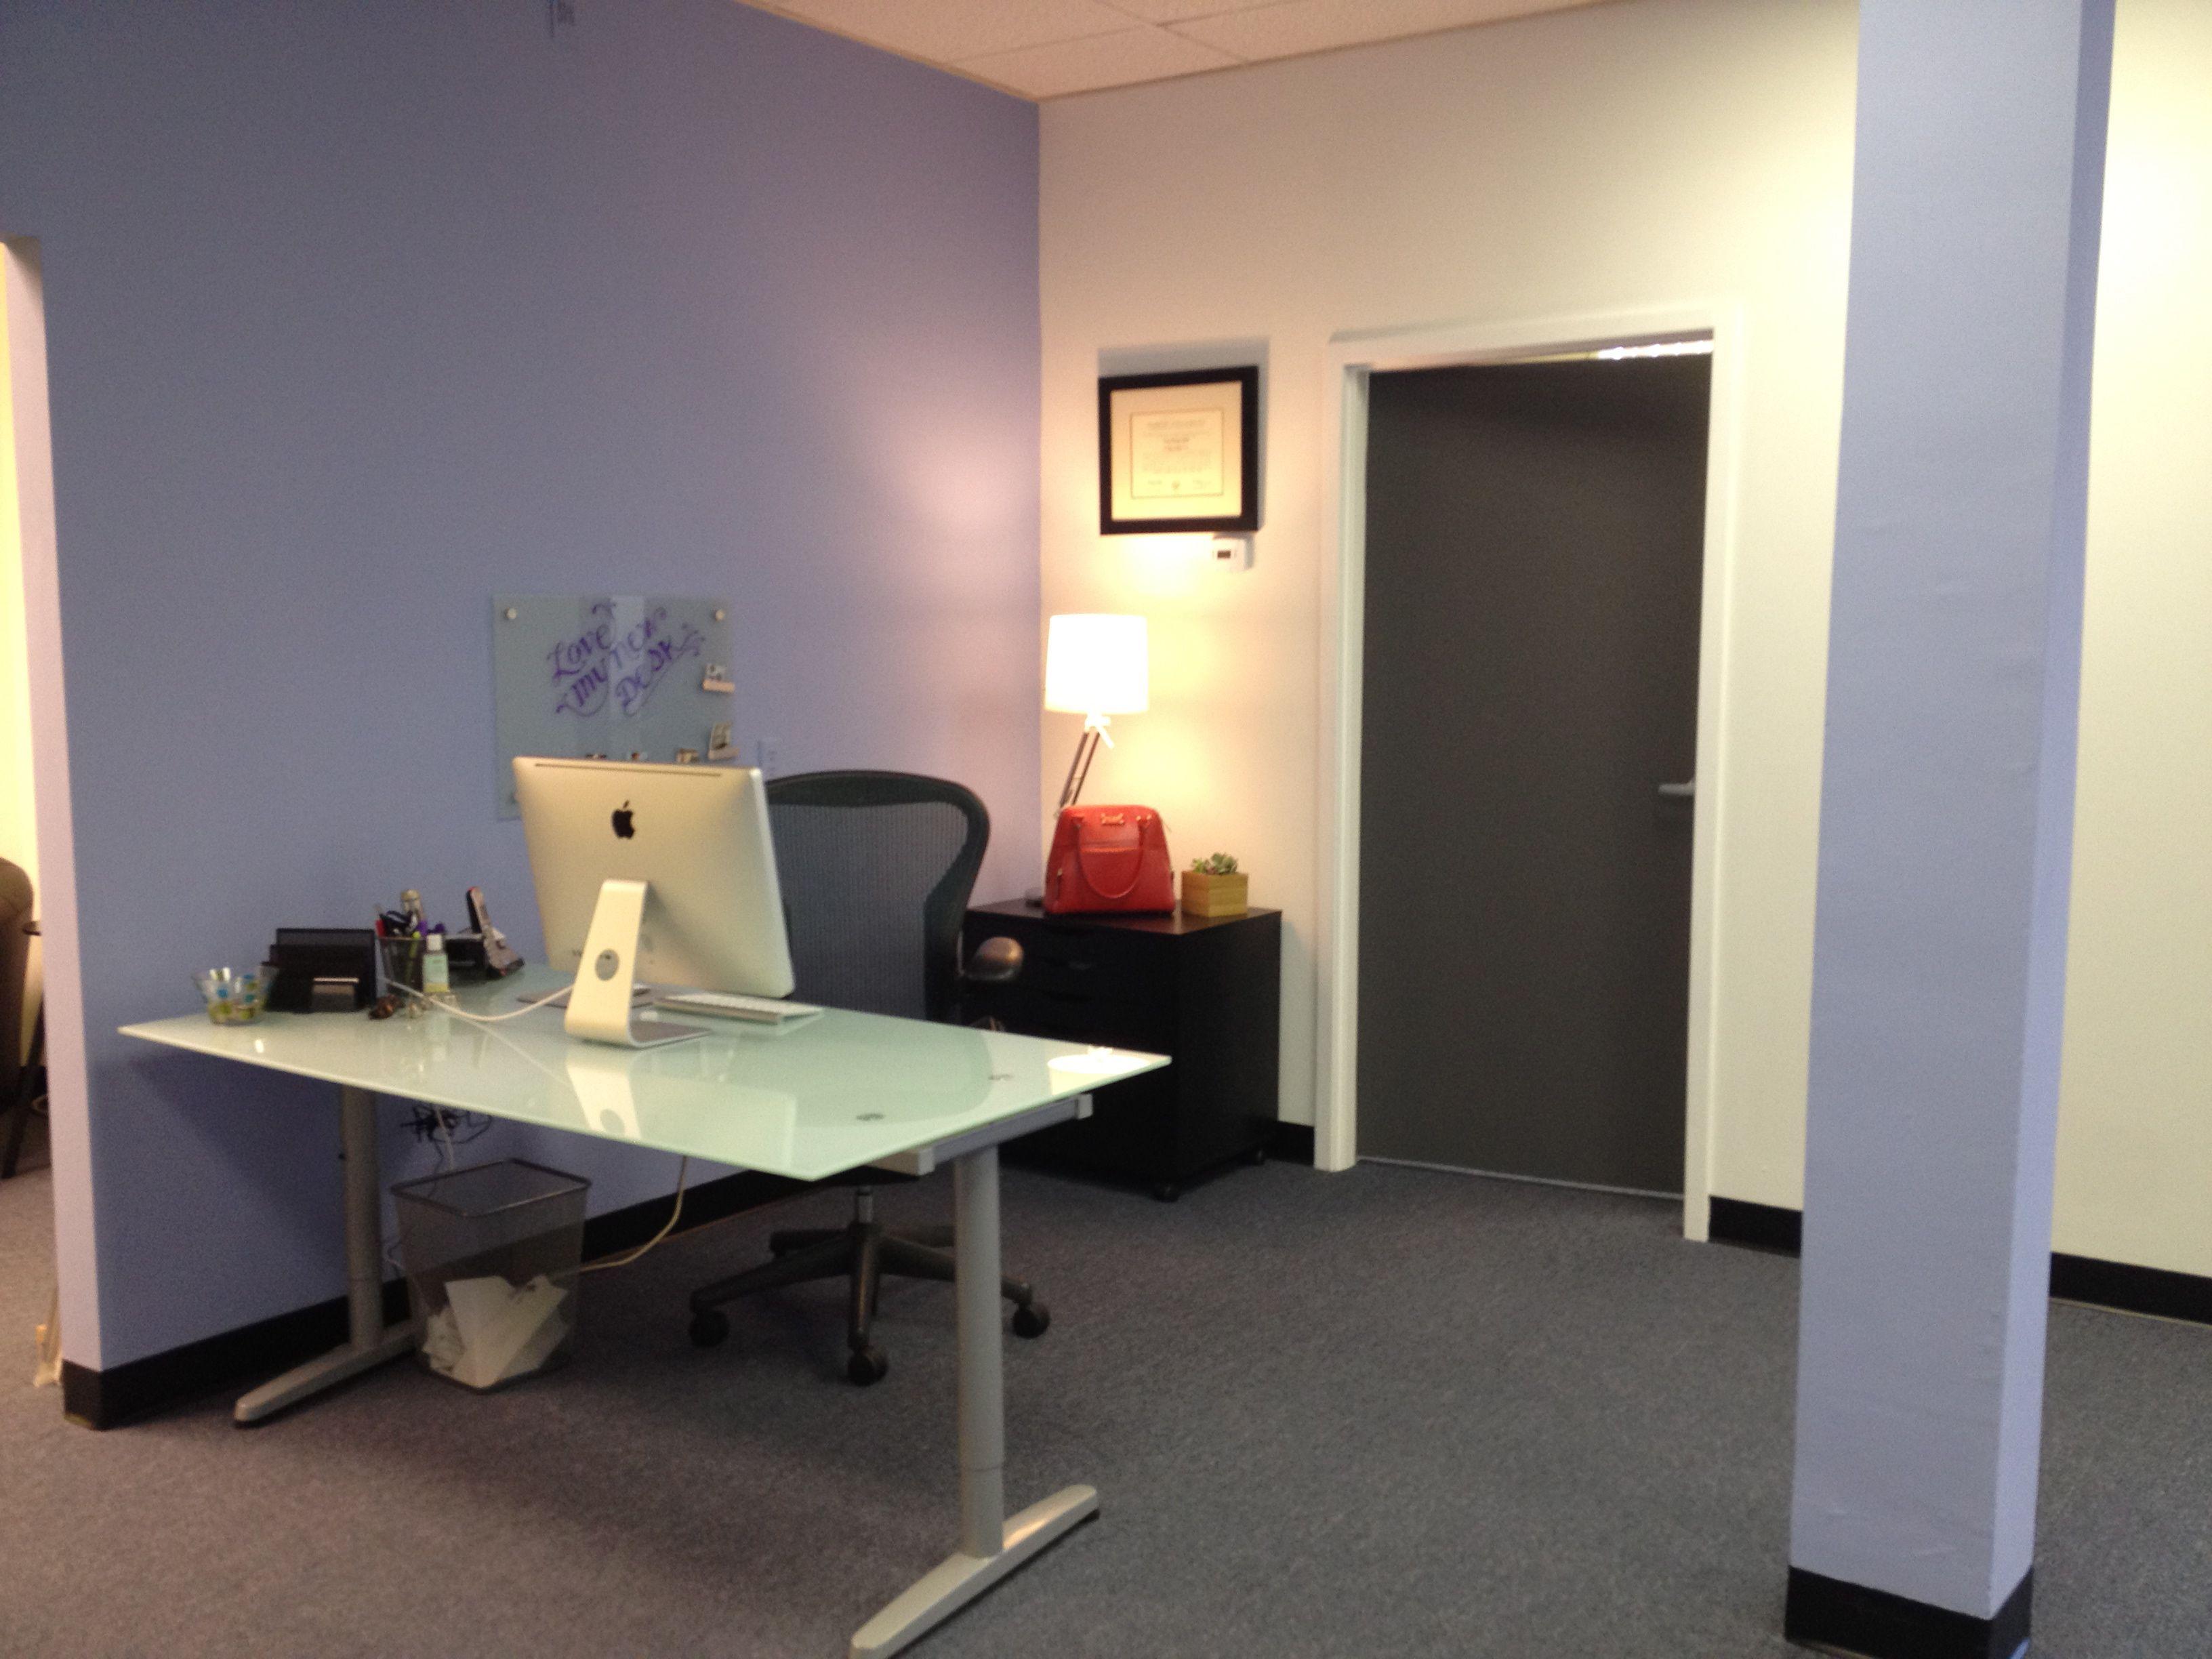 Ikea aktenschrank galant ikea galant file cabinet home office